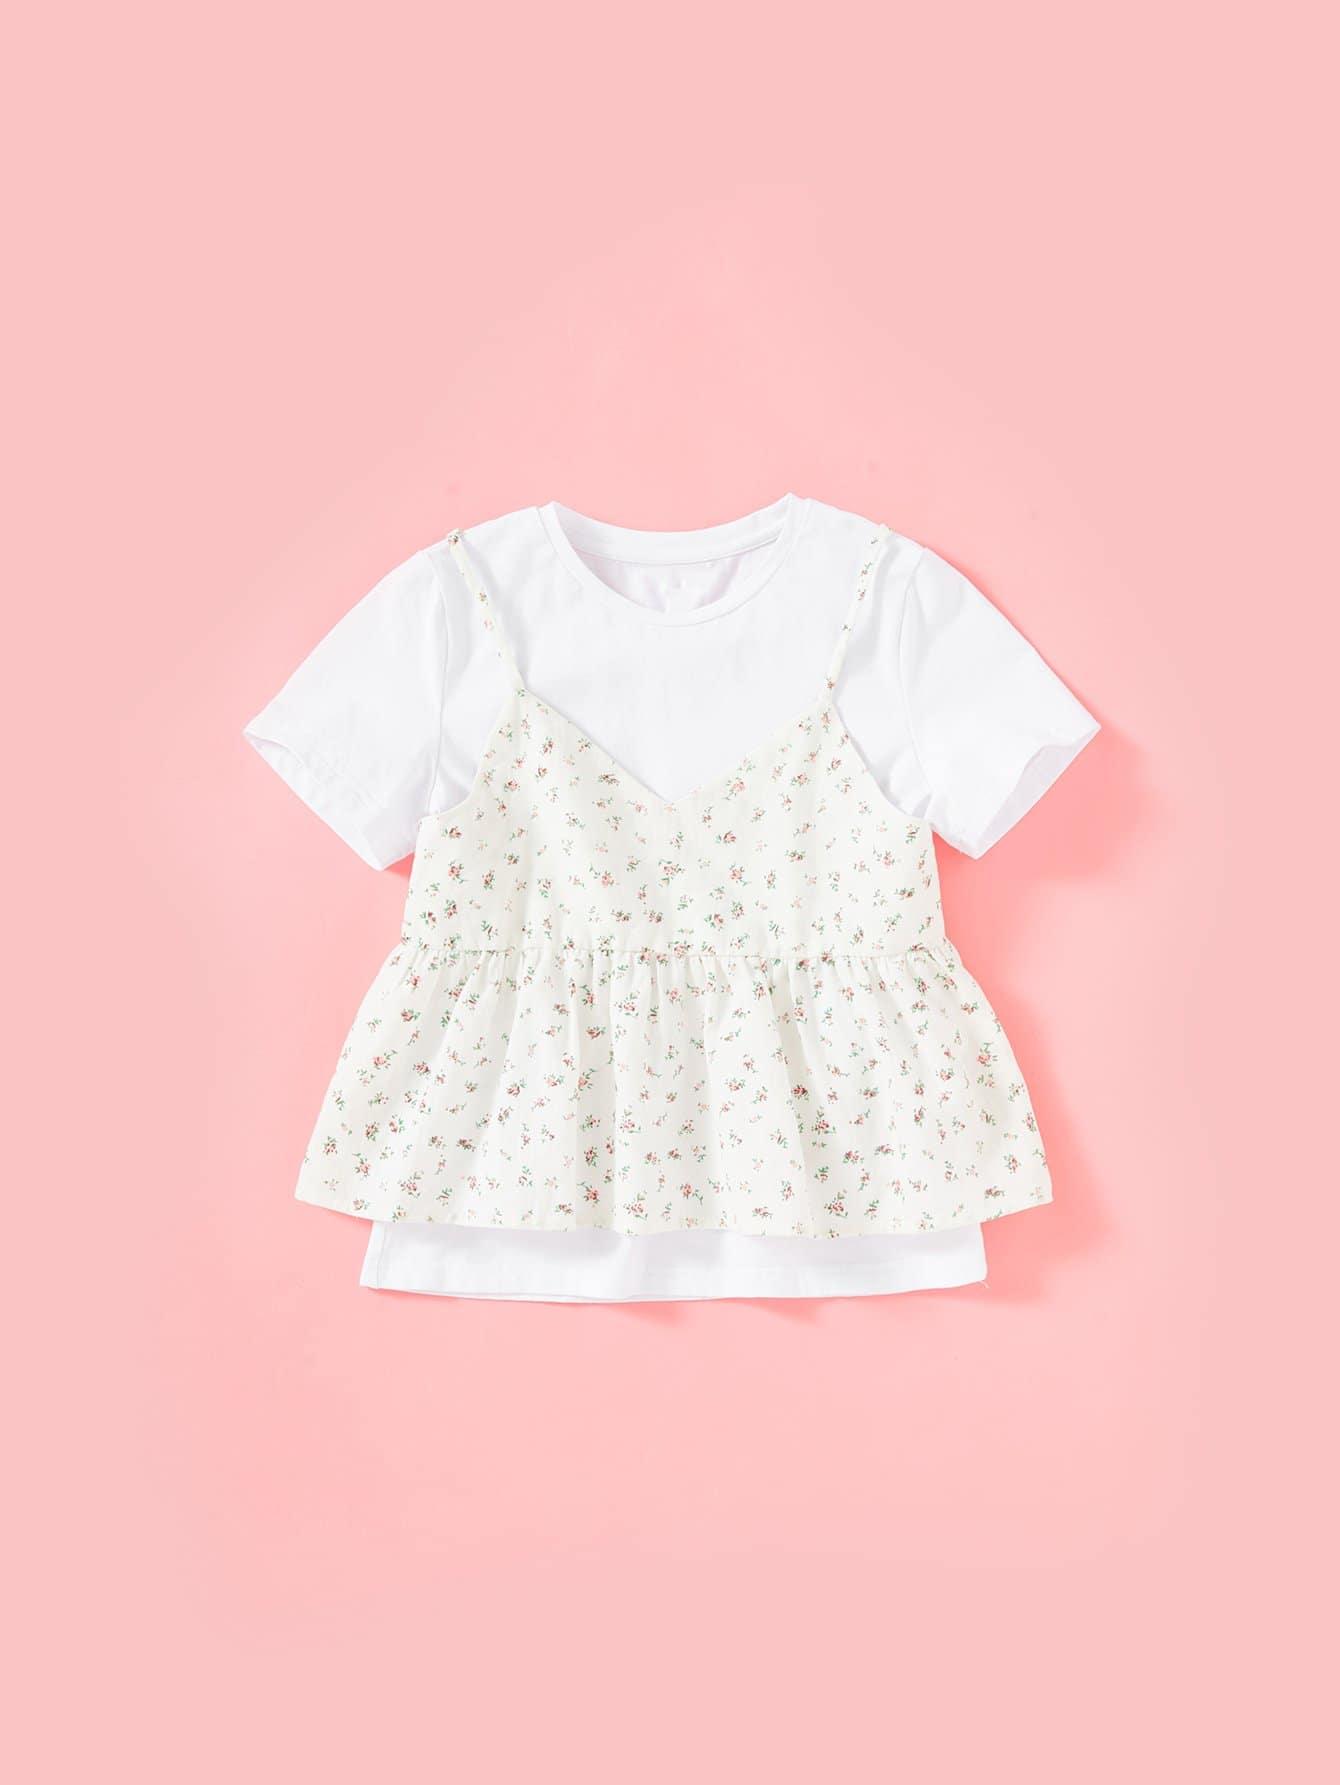 Flower Print Ruffle Hem 2 In 1 Cami Top ruffle embellished flower print cami jumpsuit